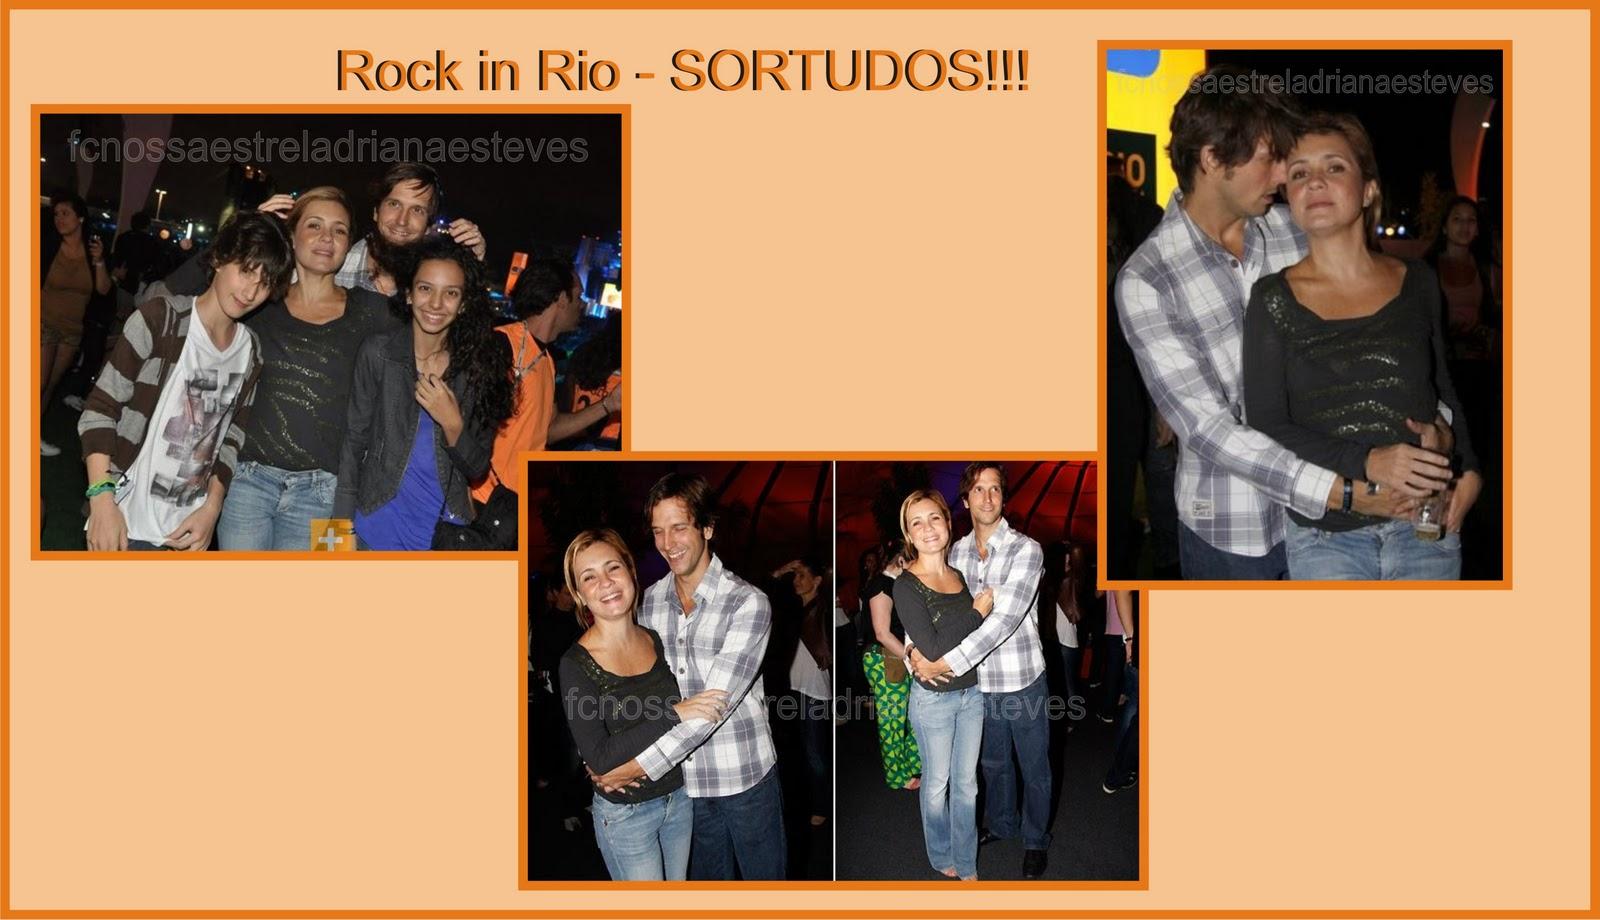 http://3.bp.blogspot.com/-FXxGFemx0sI/Tn4bBwRDZuI/AAAAAAAAAUA/Kl_Jo9OPuQo/s1600/Rock+in+Rio+2011.JPG